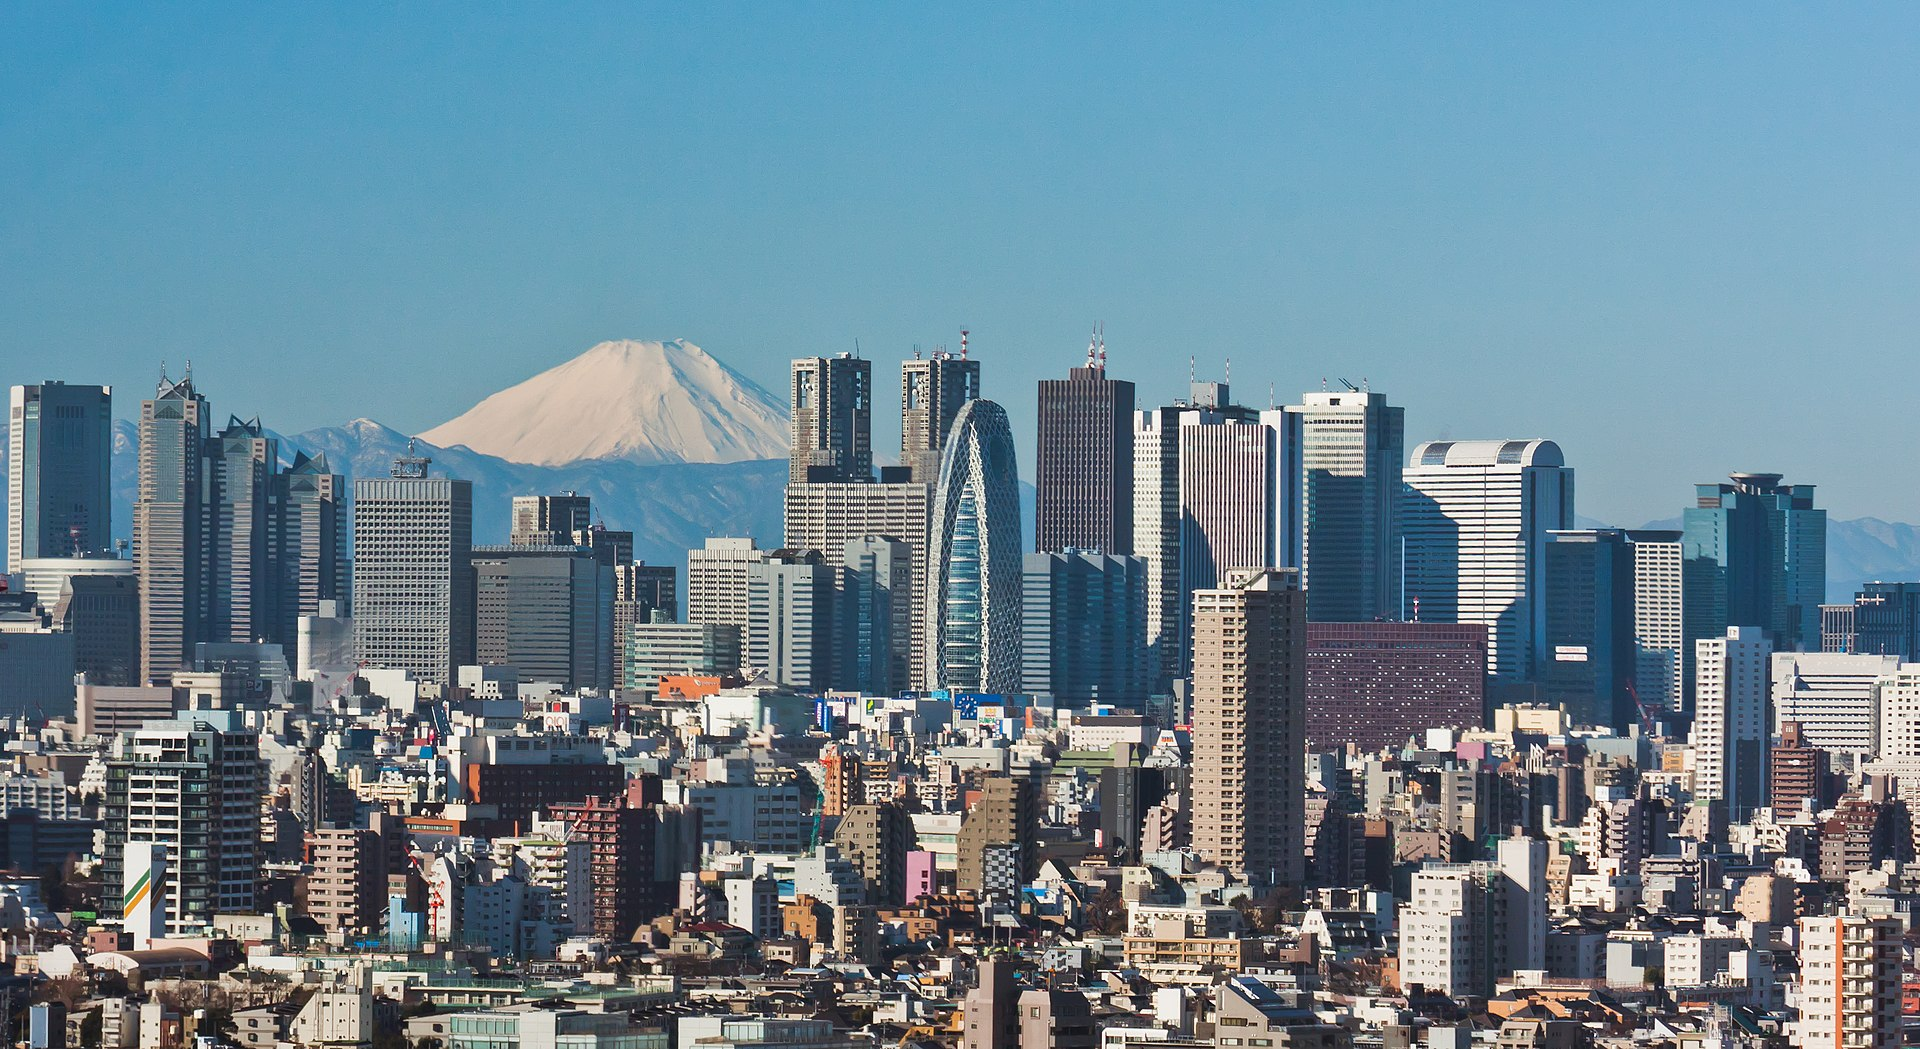 Јапан 1920px-Skyscrapers_of_Shinjuku_2009_January_%28revised%29